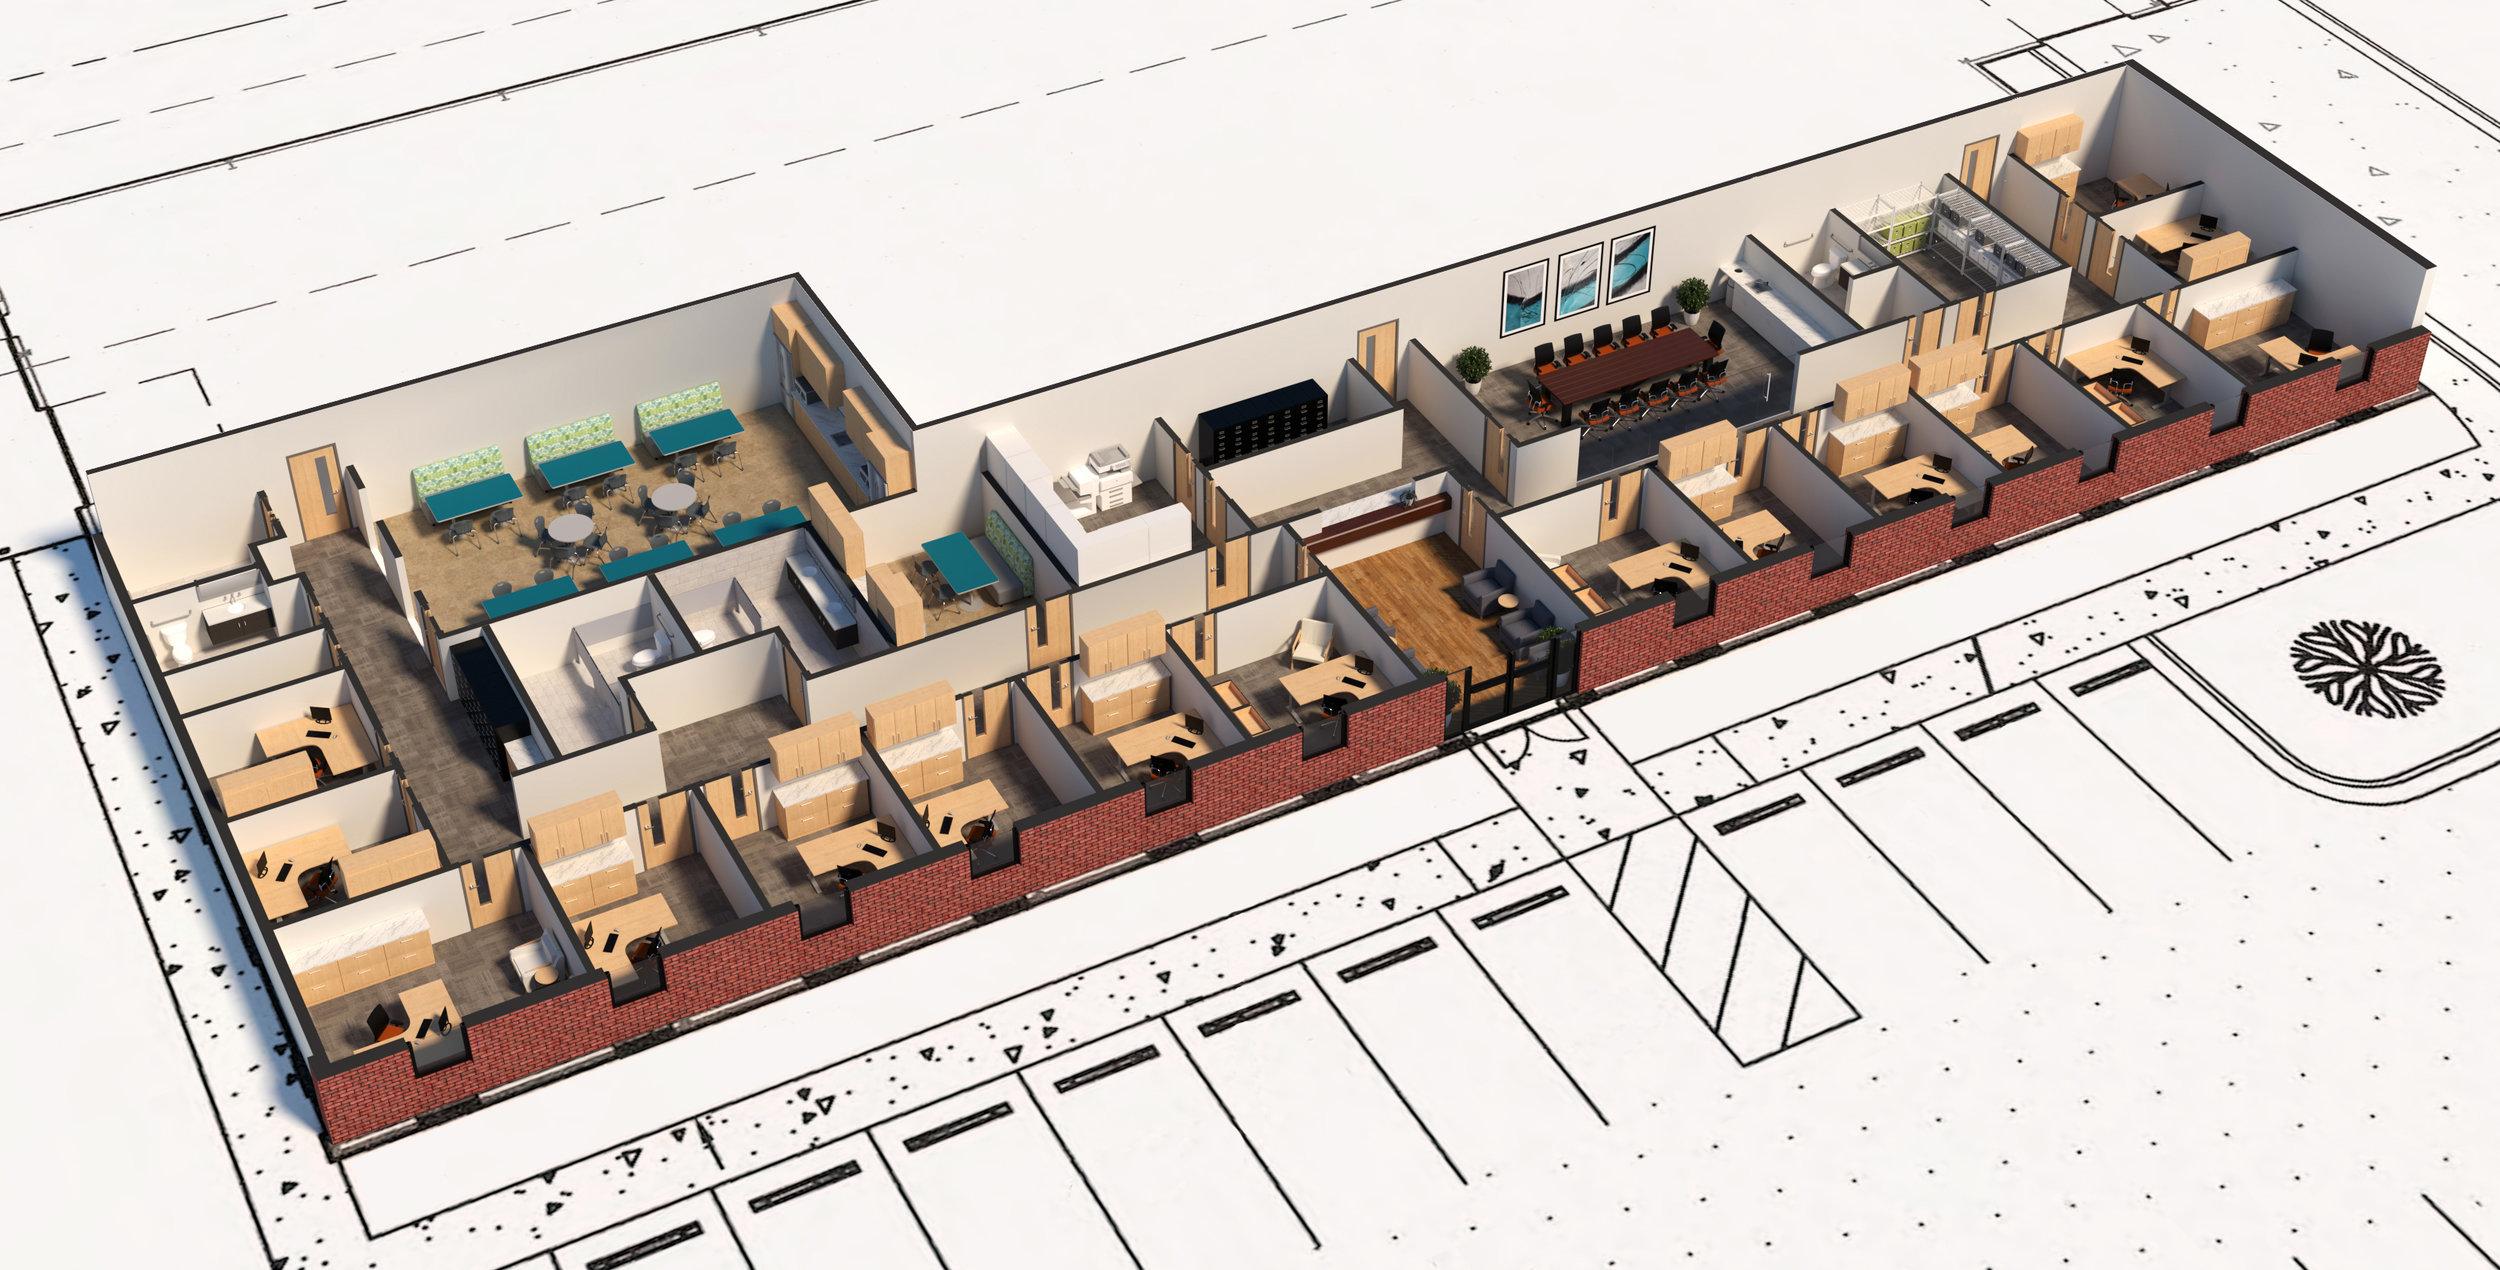 3D Floorplan - Office Building.jpg